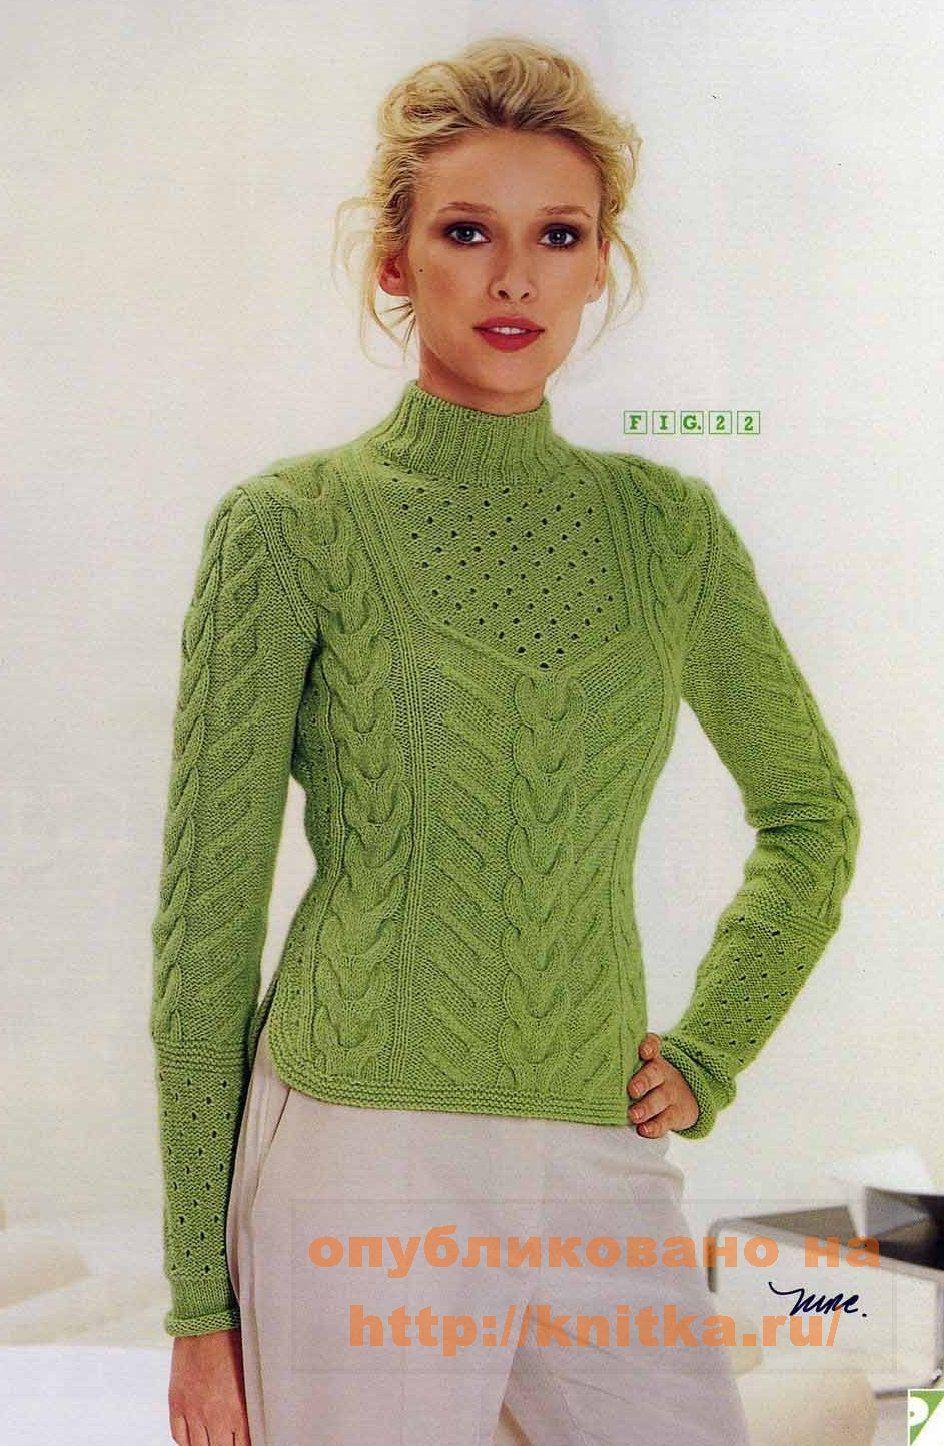 http://knitka.ru/knitting-schemes-pictures/2009/05/k1.jpg